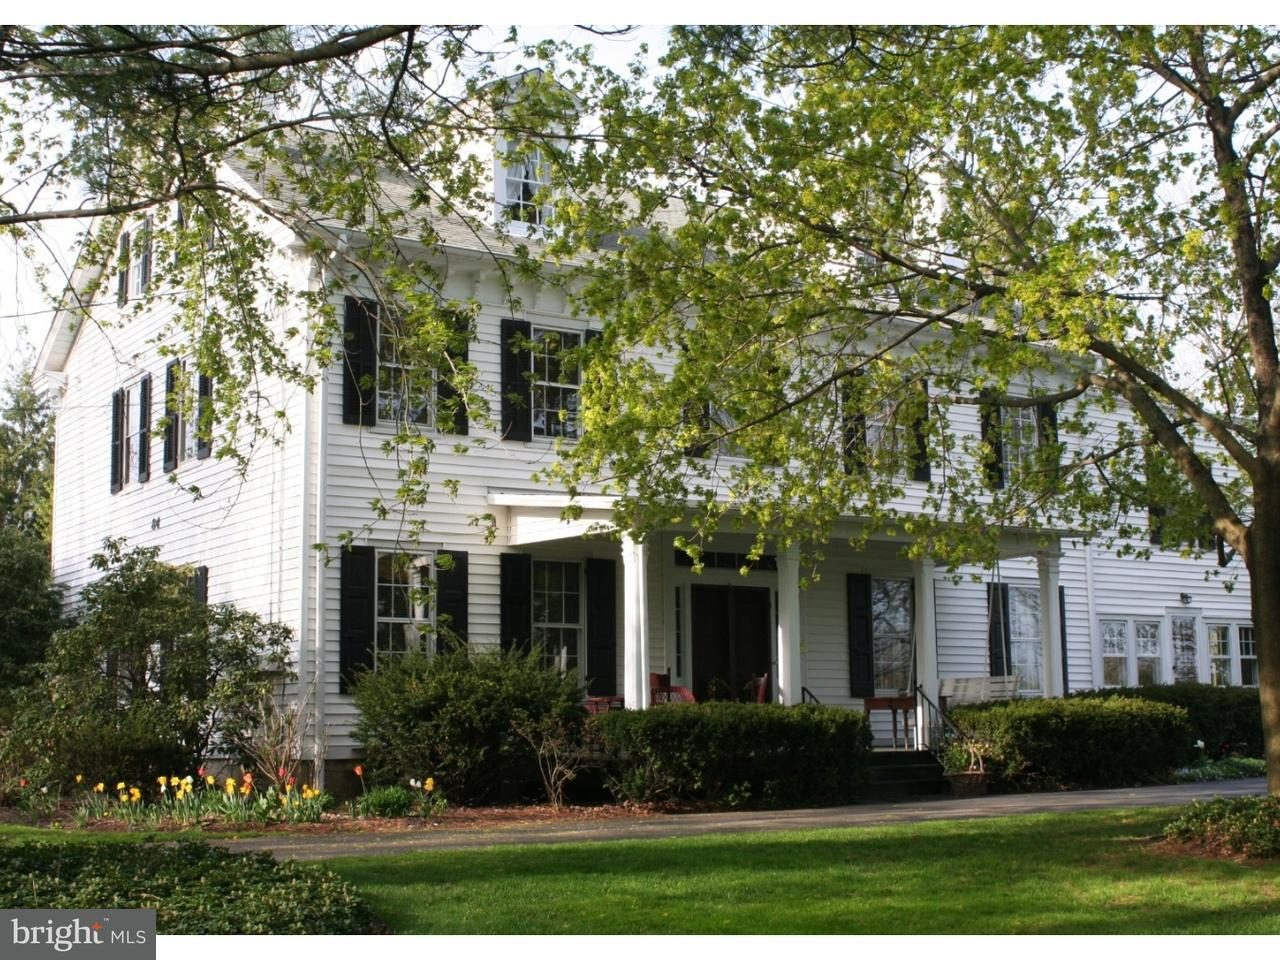 独户住宅 为 销售 在 84 WALNFORD Road Allentown, 新泽西州 08501 美国在/周边: Upper Freehold Township